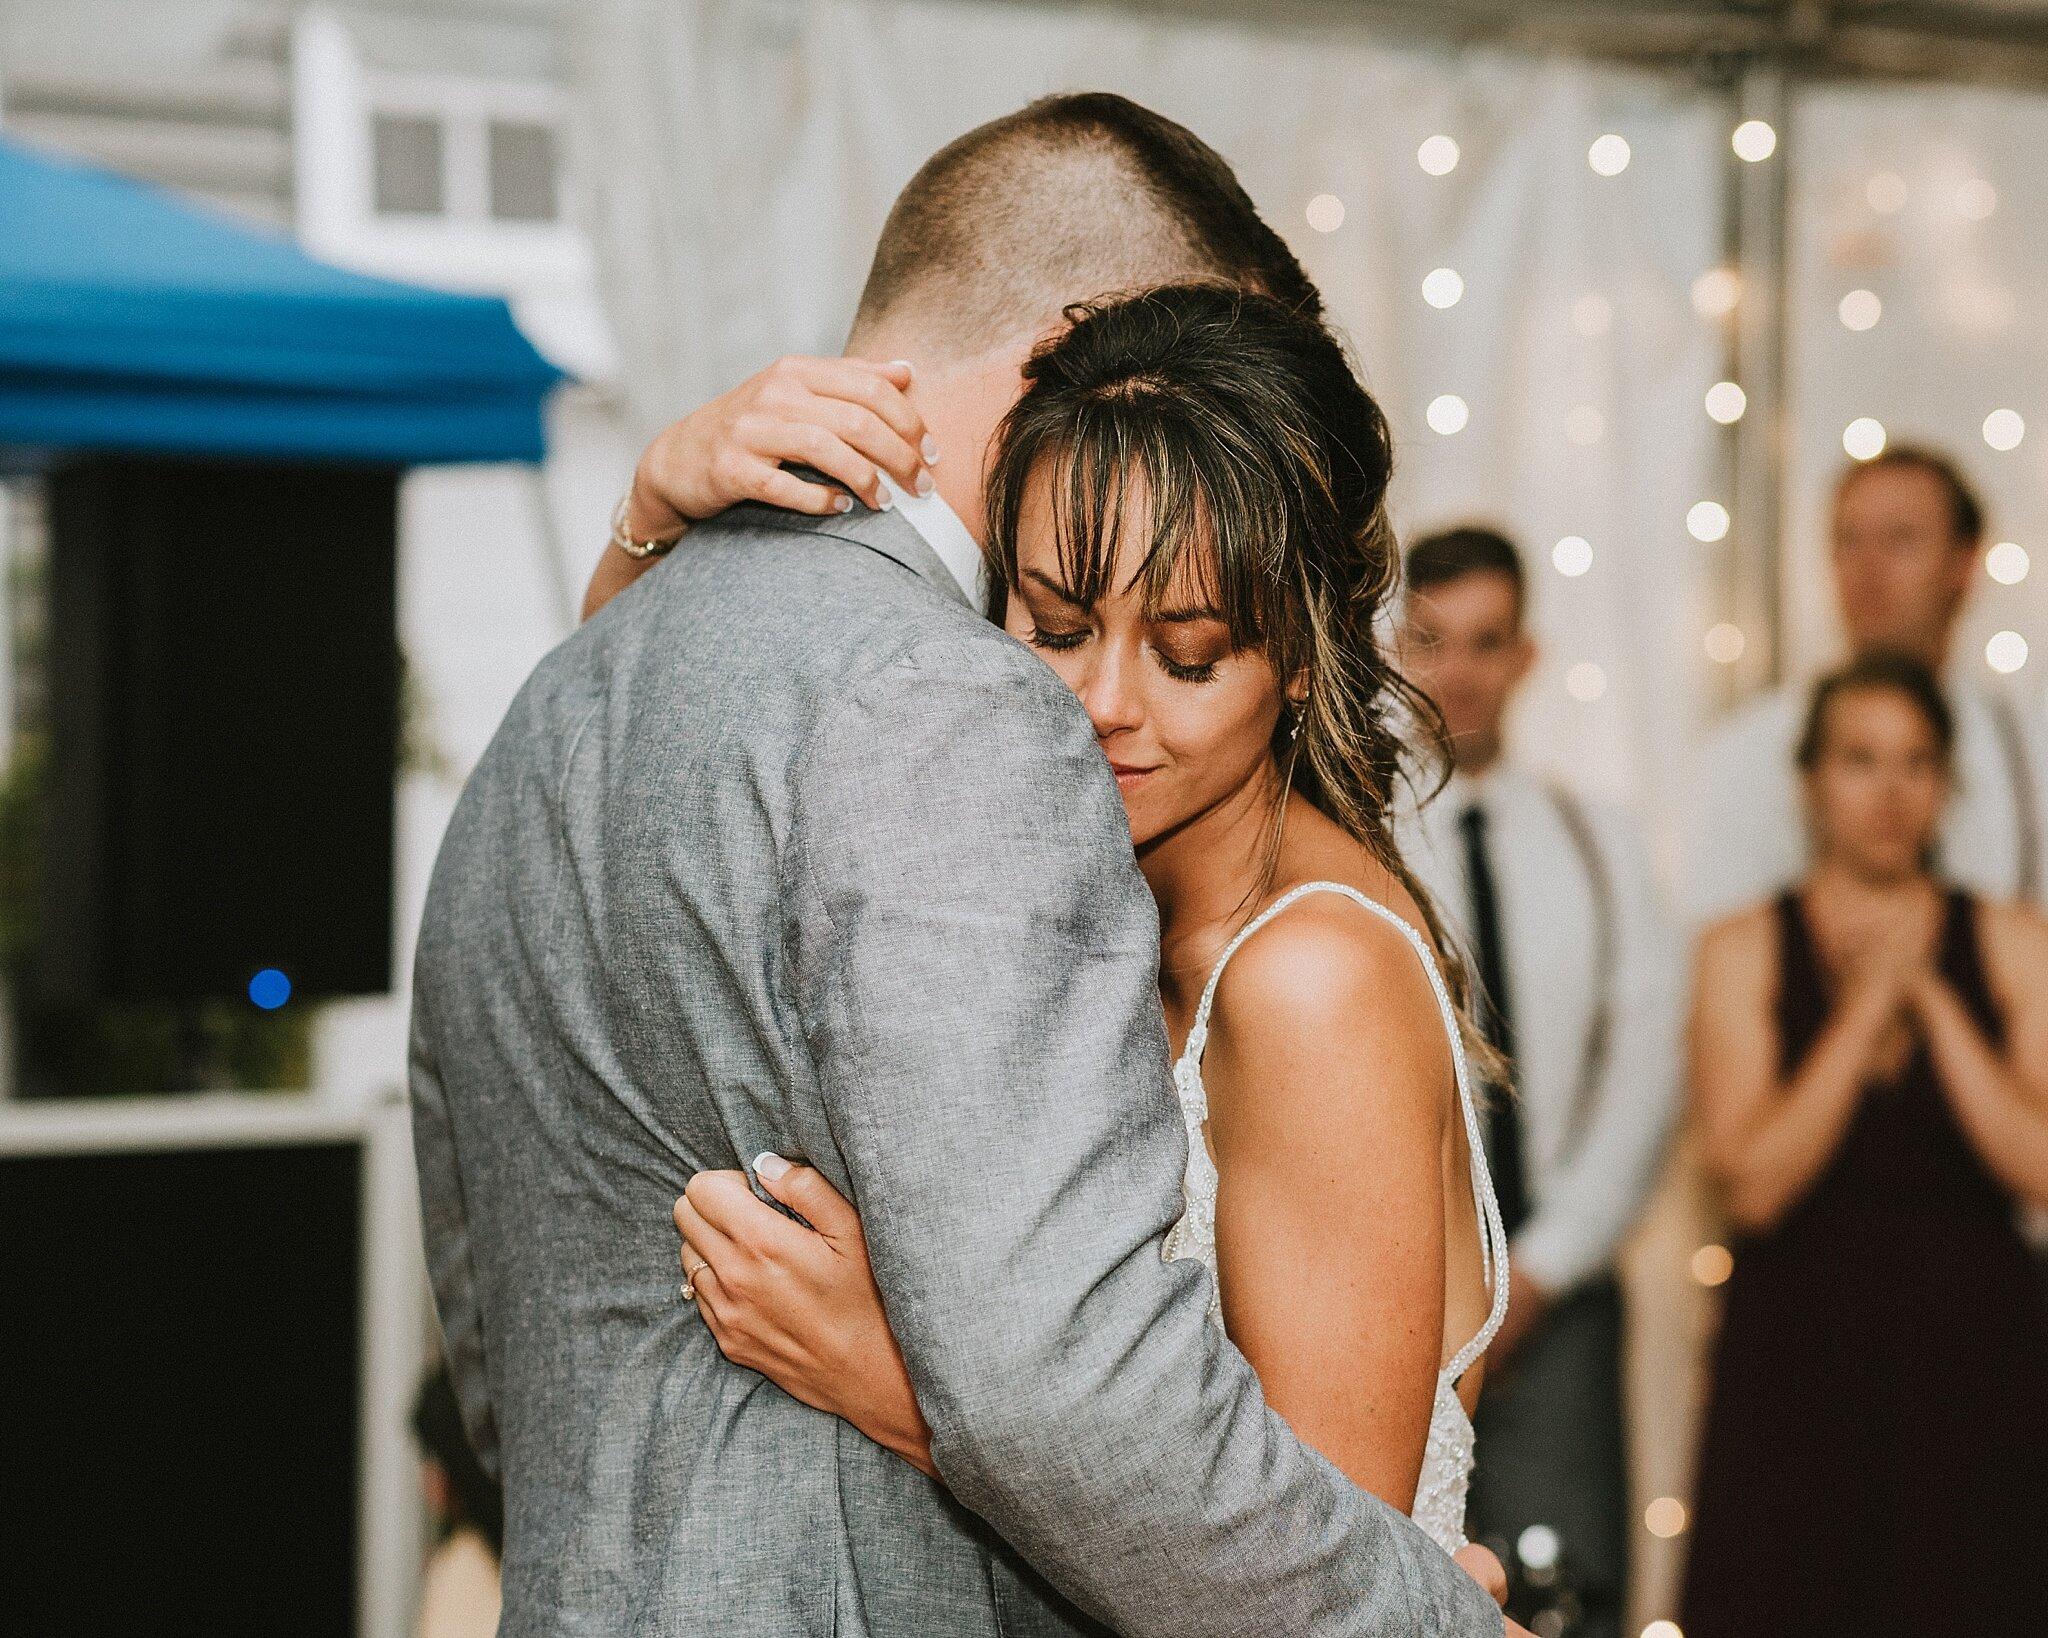 connecticut_wedding_3098.jpg